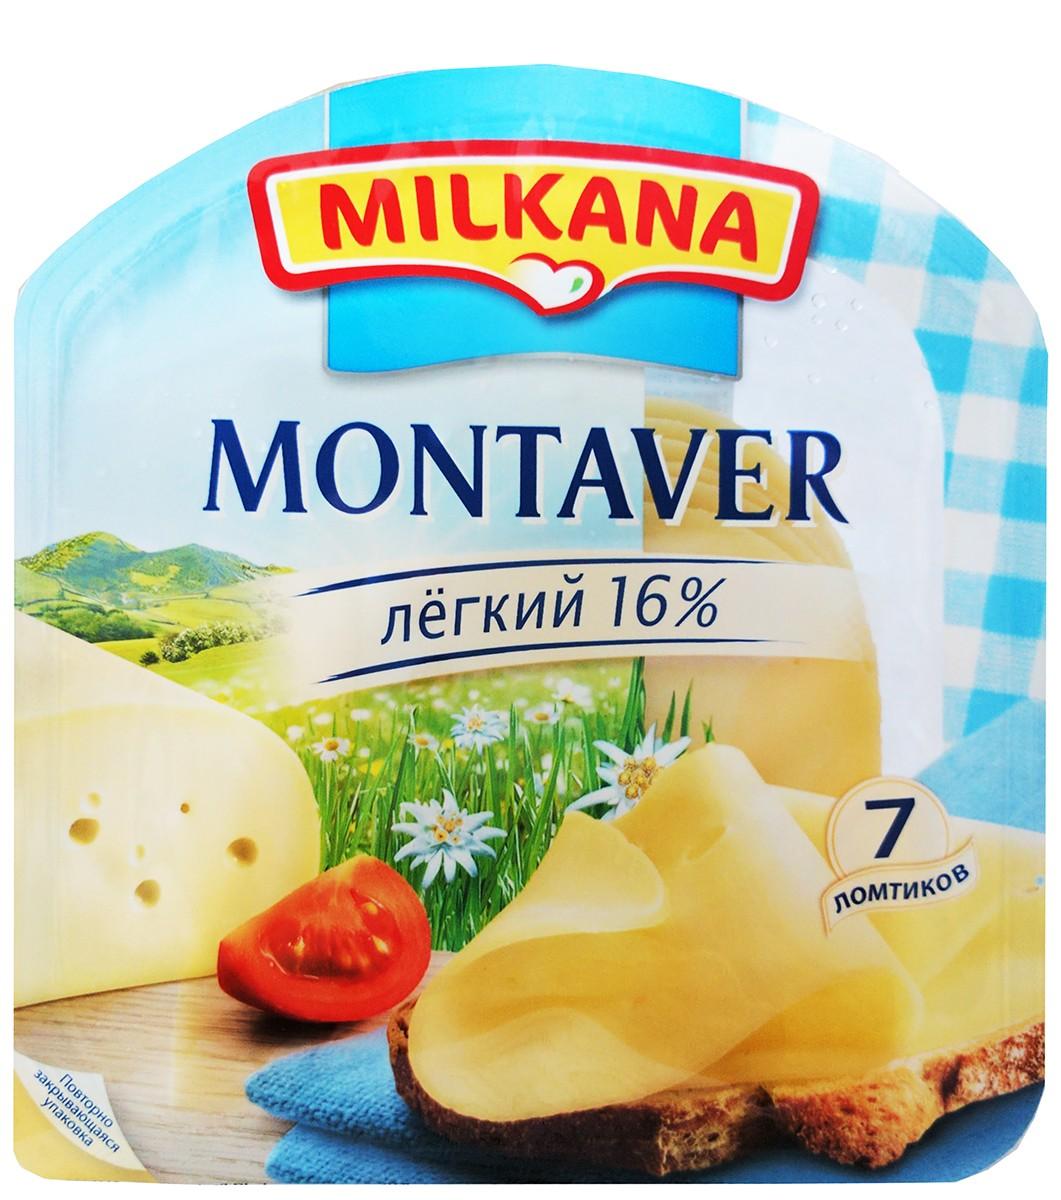 Сир Montaver Light Milkana фото